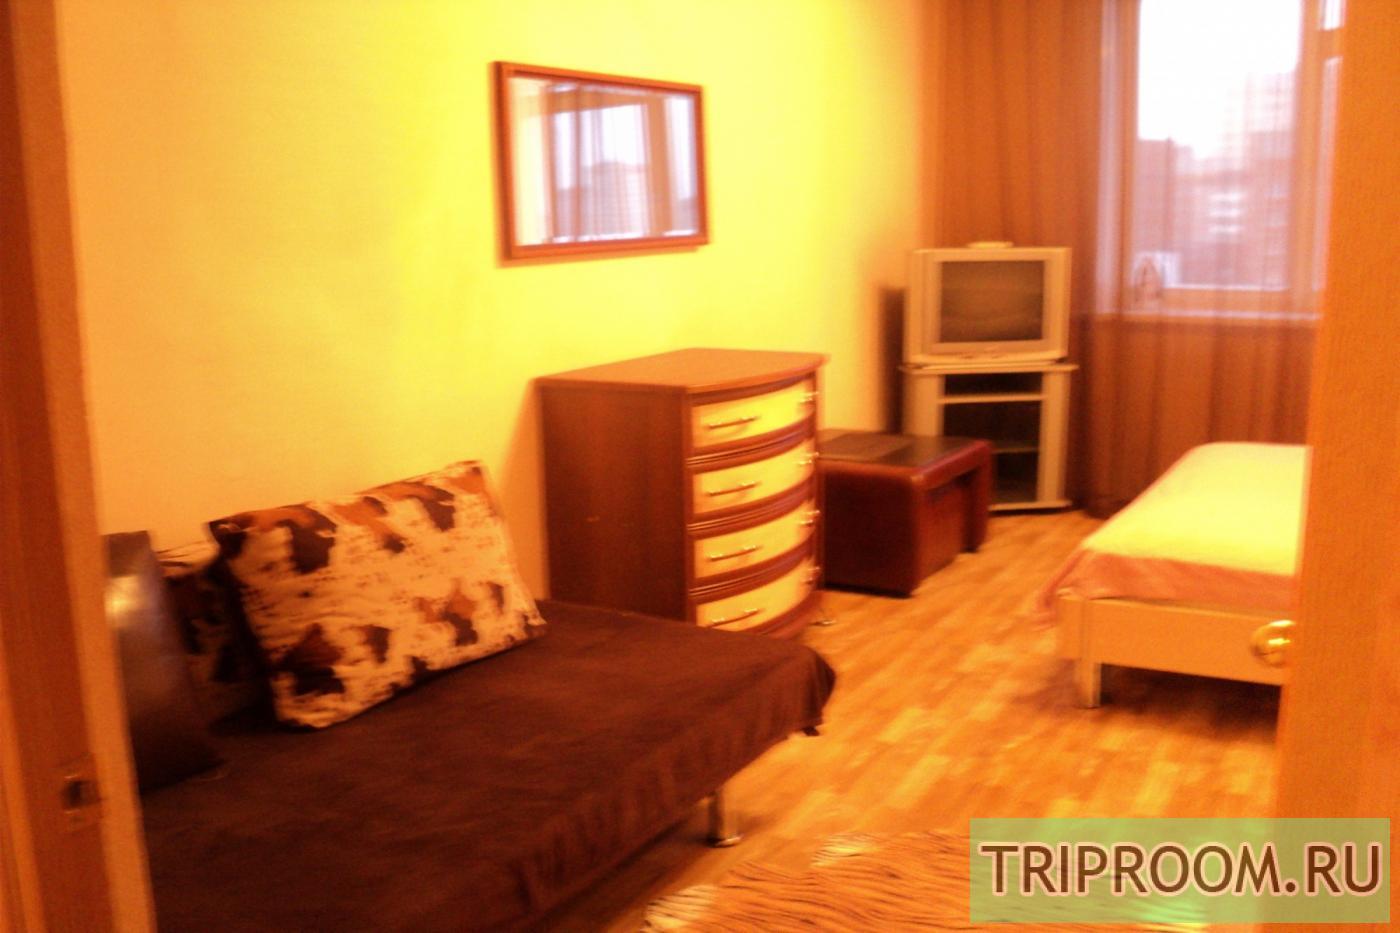 1-комнатная квартира посуточно (вариант № 5905), ул. Алексеева улица, фото № 3